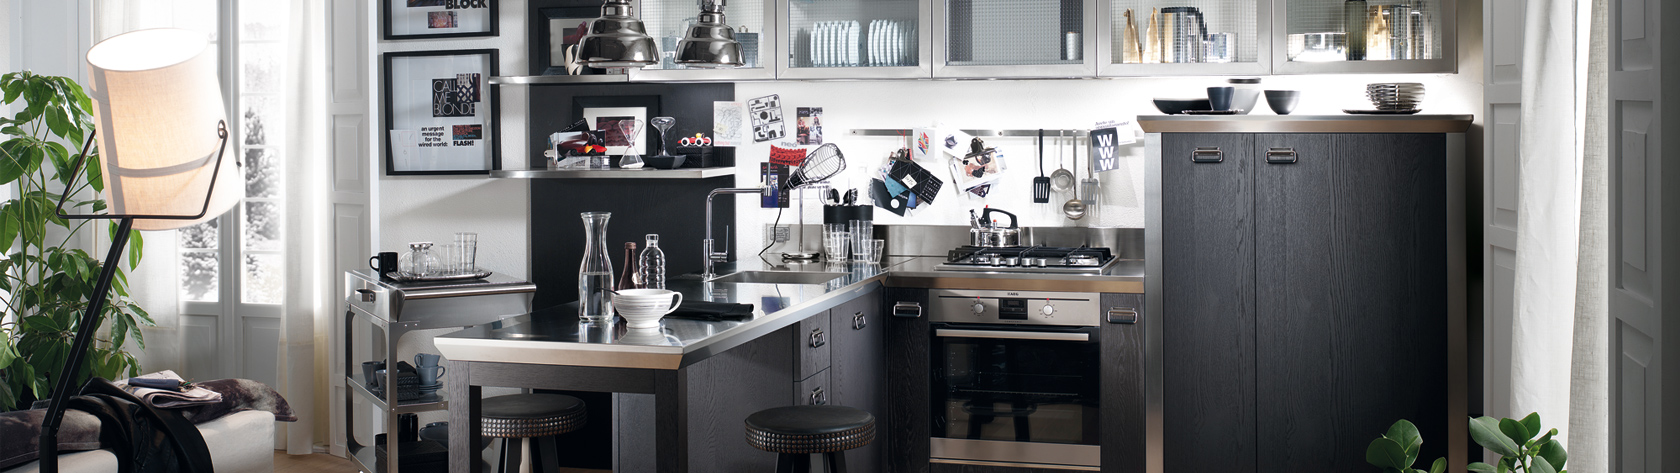 Scavolini diesel cucina rock interior design e - Scavolini cucine diesel ...